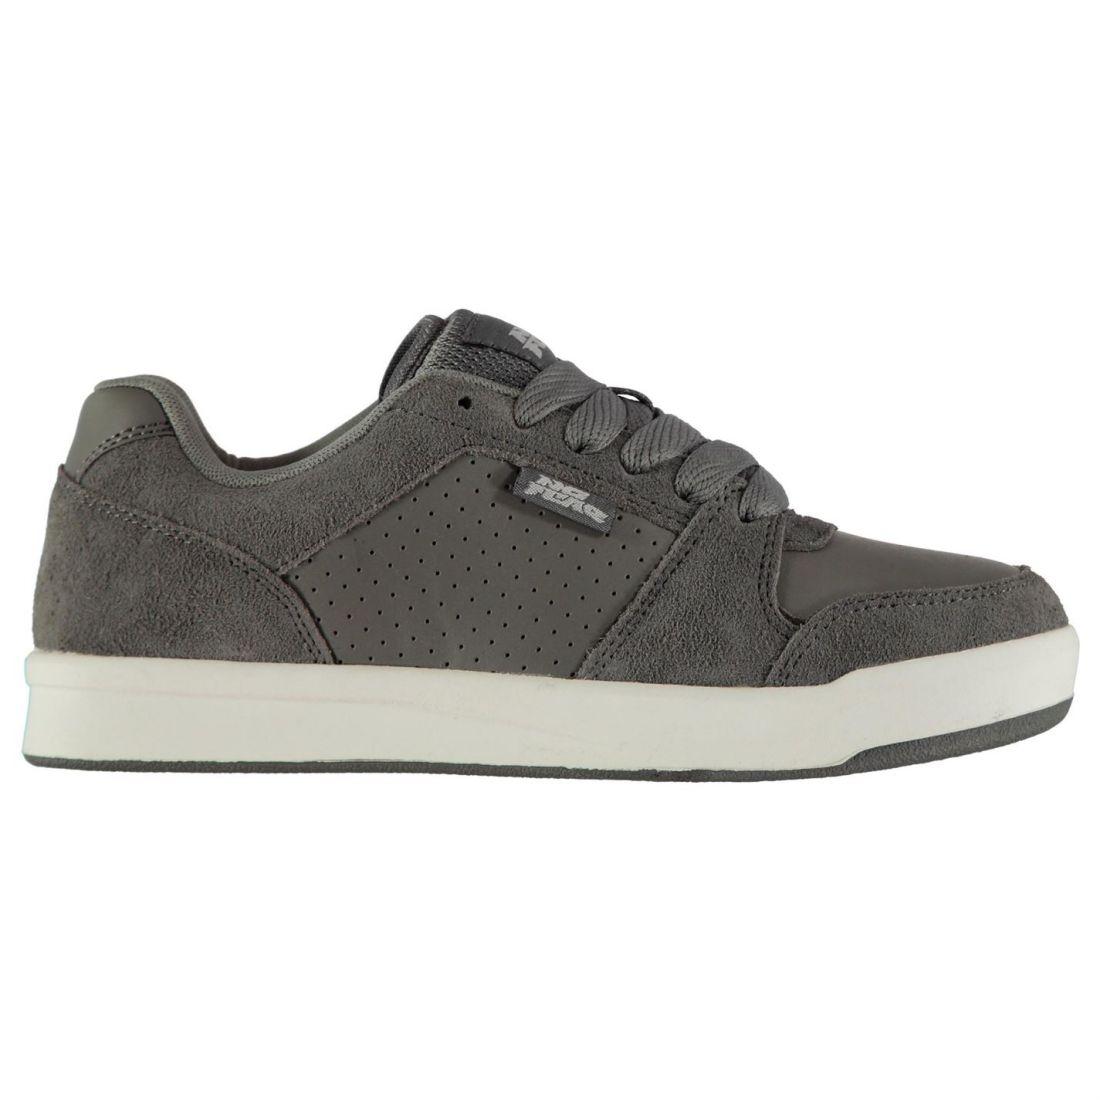 a034644d603 No Fear Mens Shift 2 Skate Shoes Low Lace Up Fashion Trainers ...